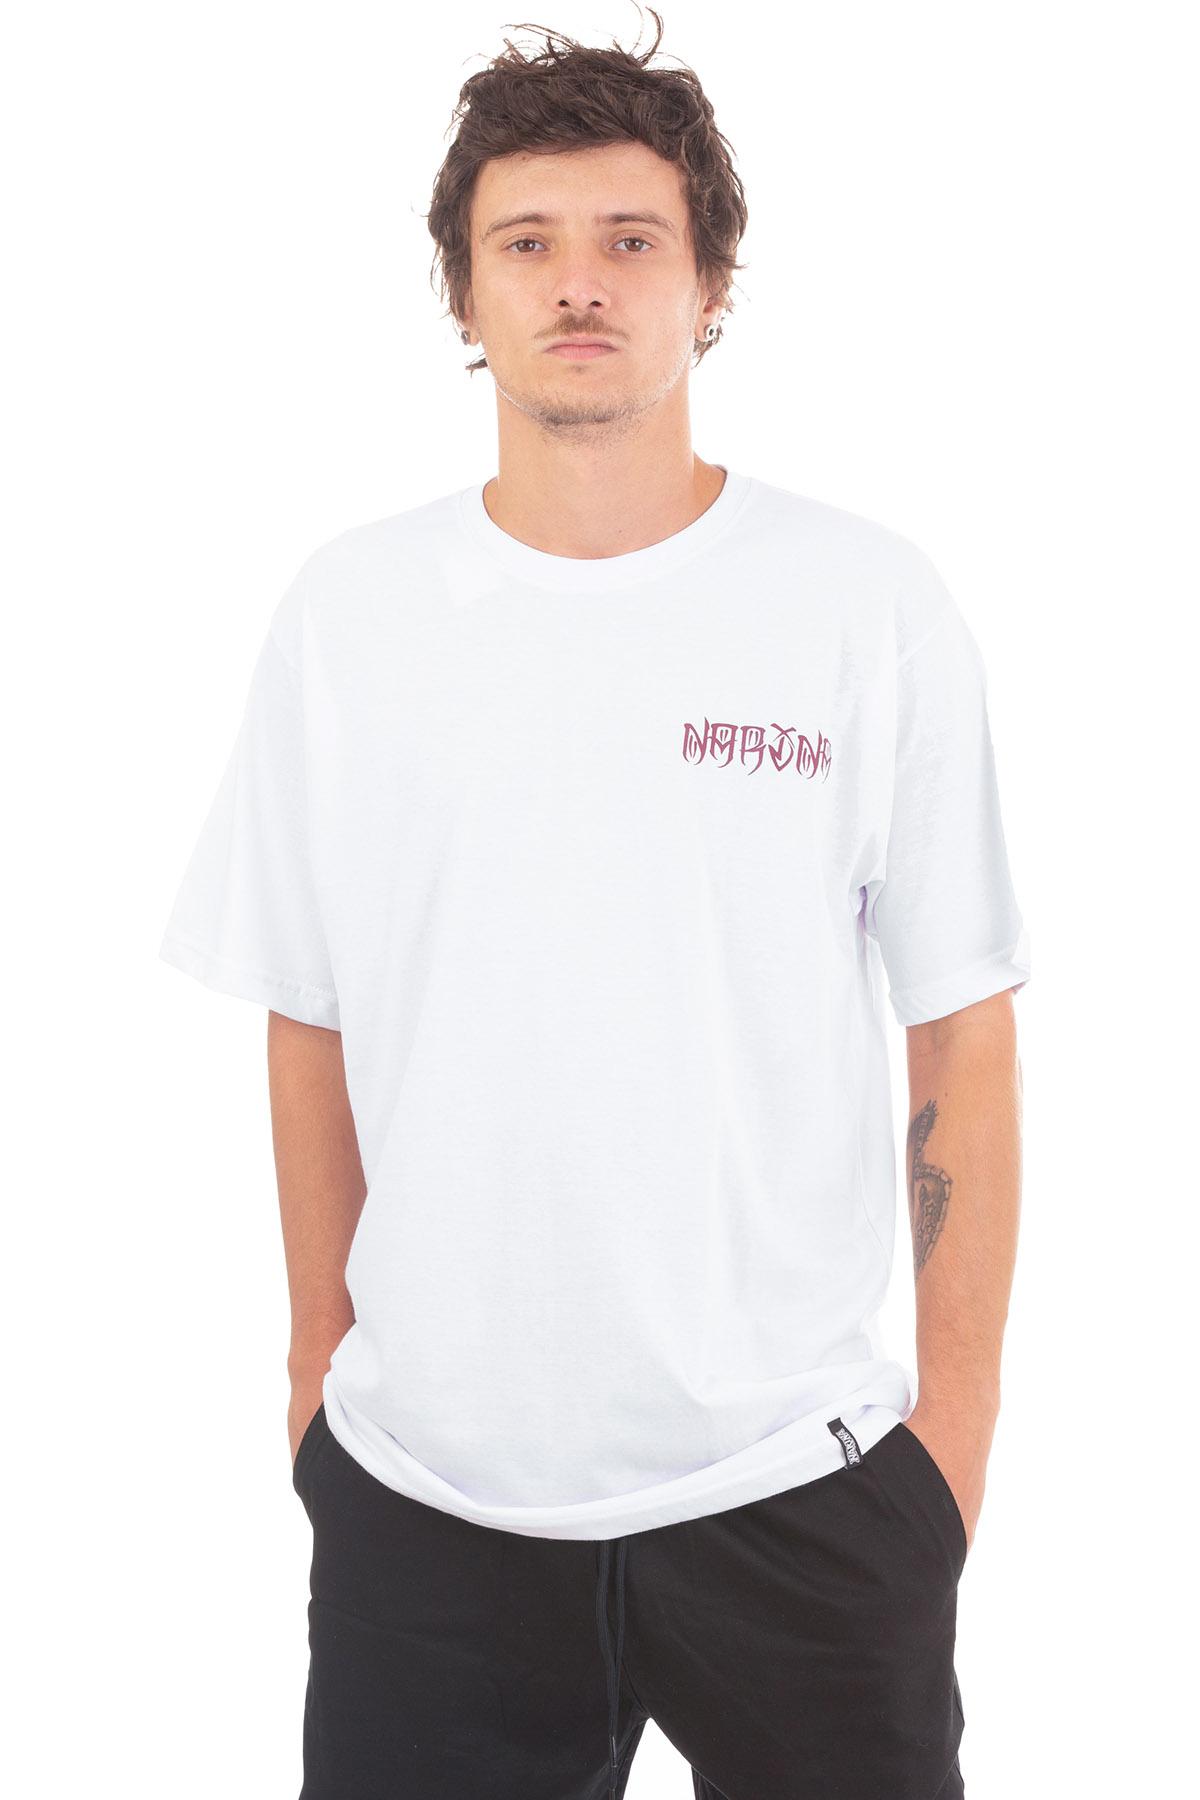 Camiseta Manga Curta Narina Skate Letreiro